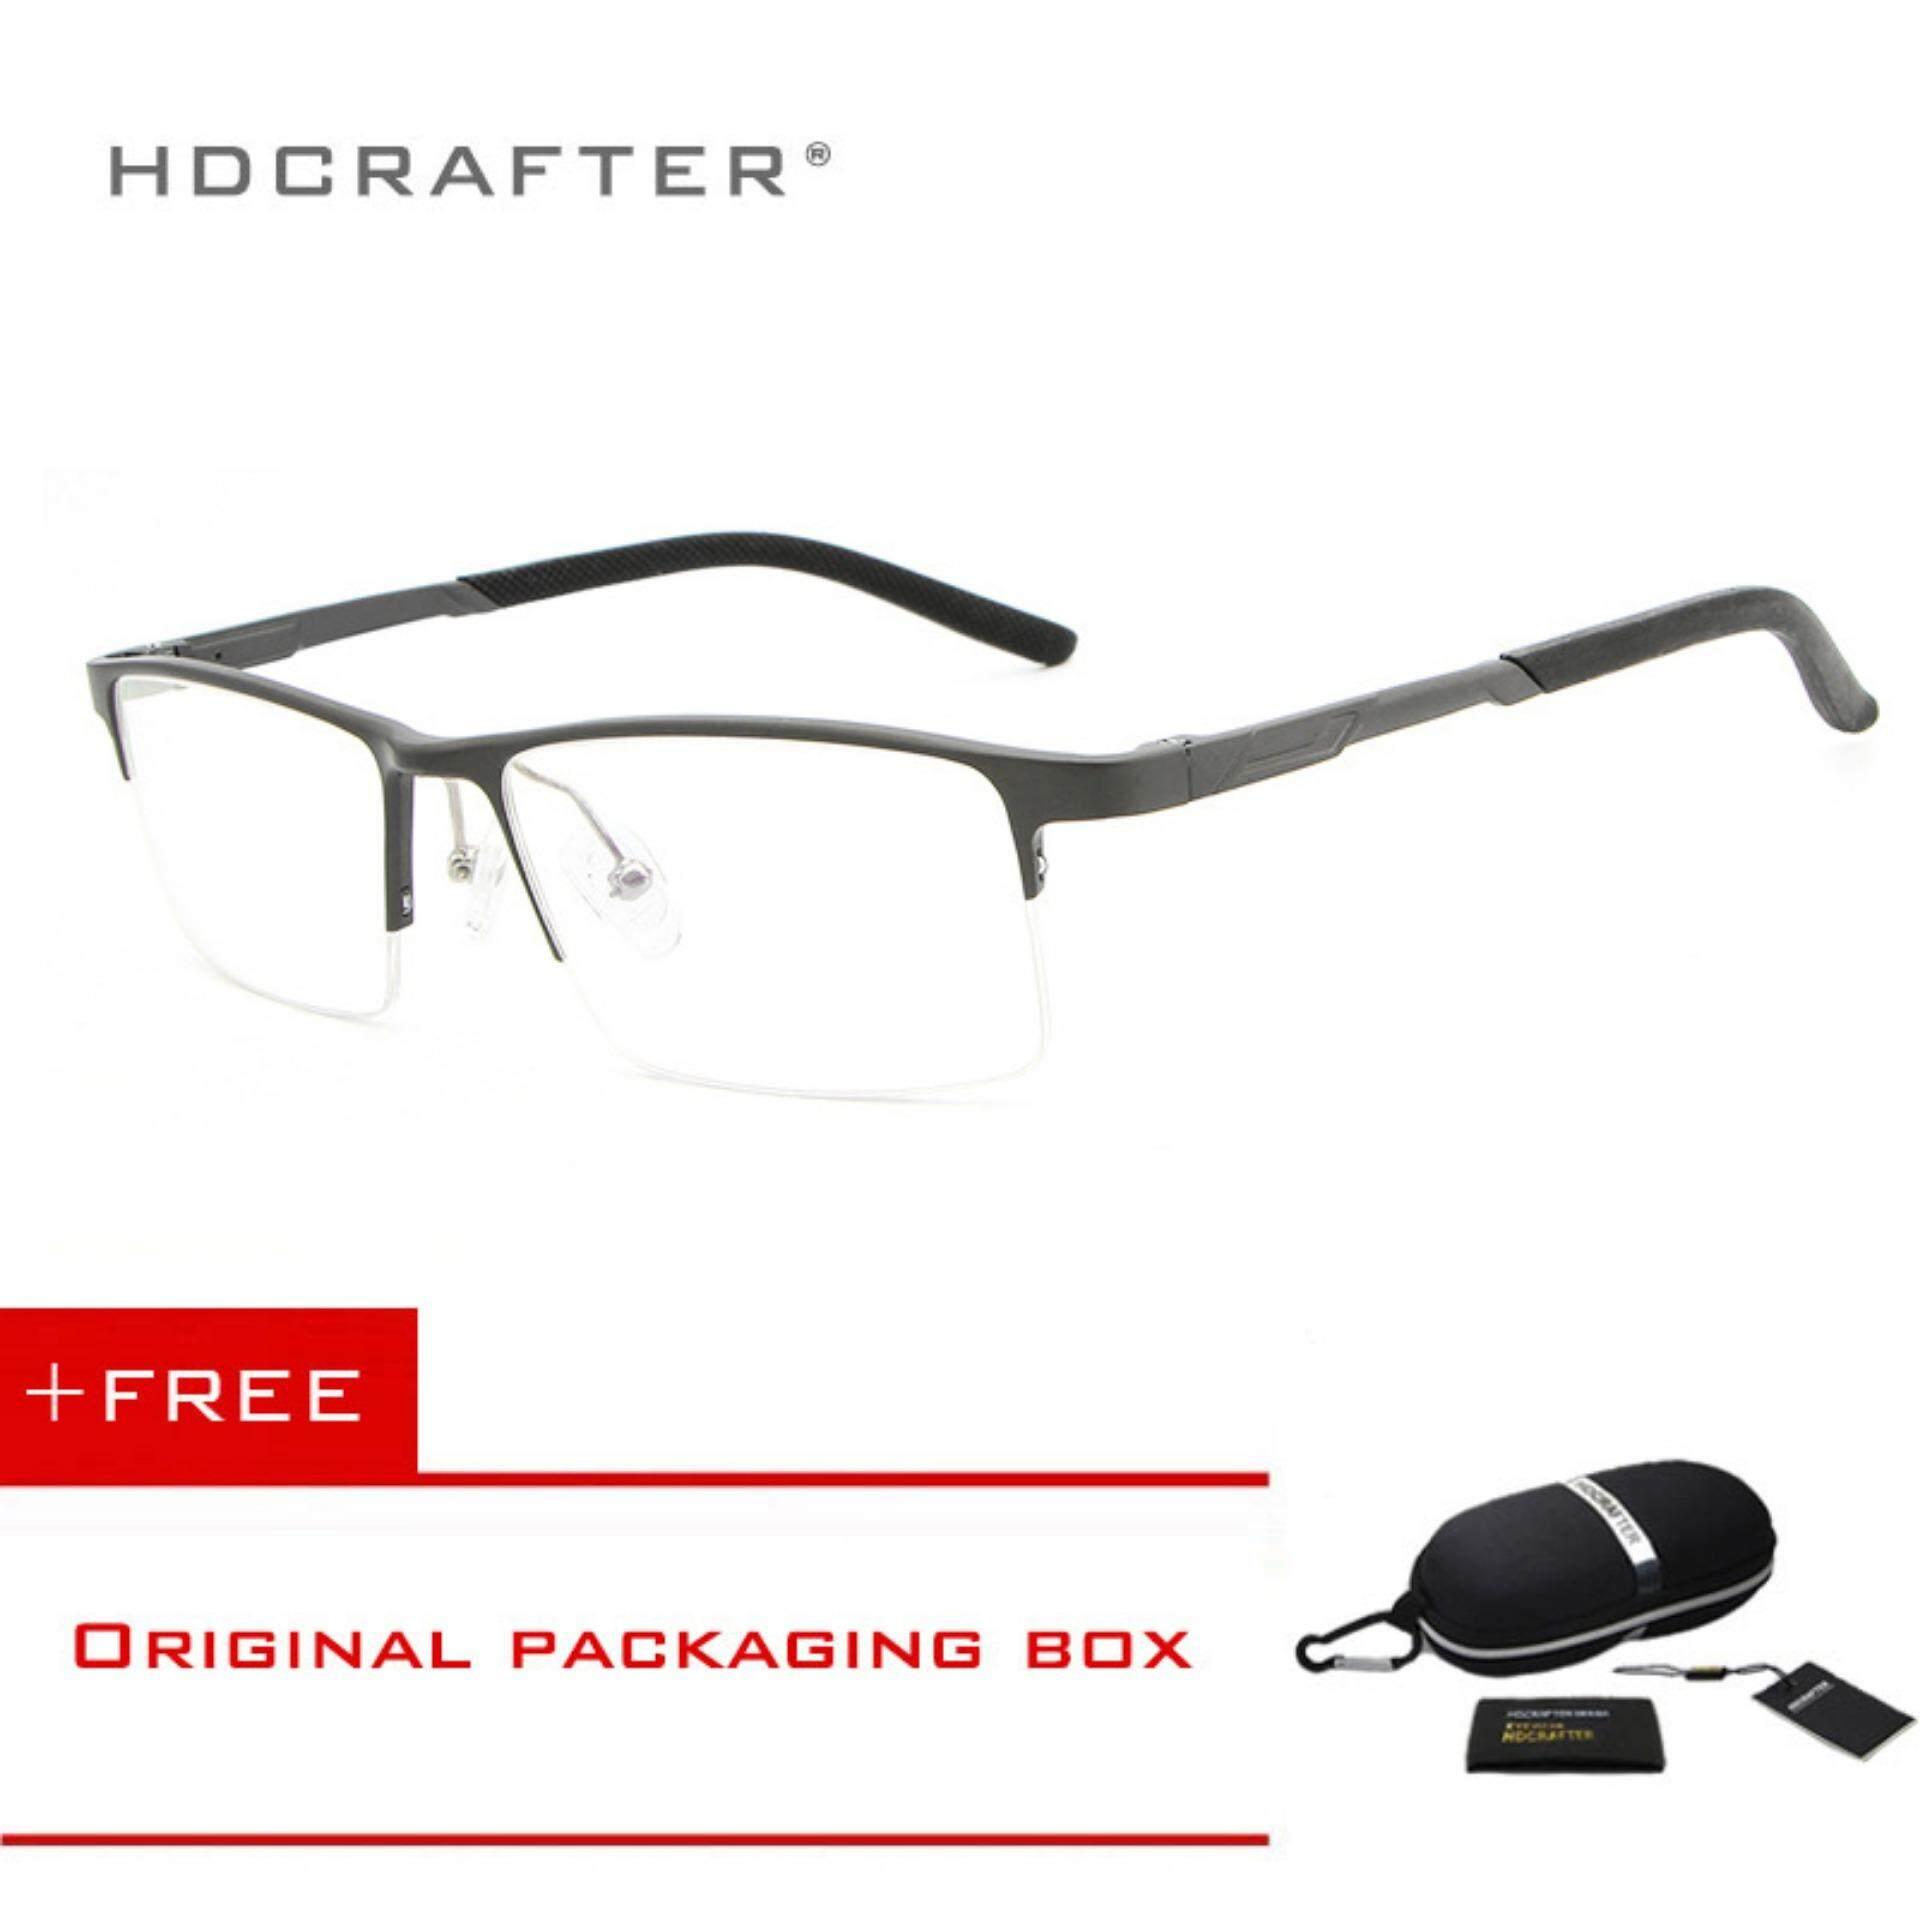 HDCRAFTER New Design Aluminum Magnesium Ultra-light Glasses Computer Goggles Anti Fatigue Radiation-resistant